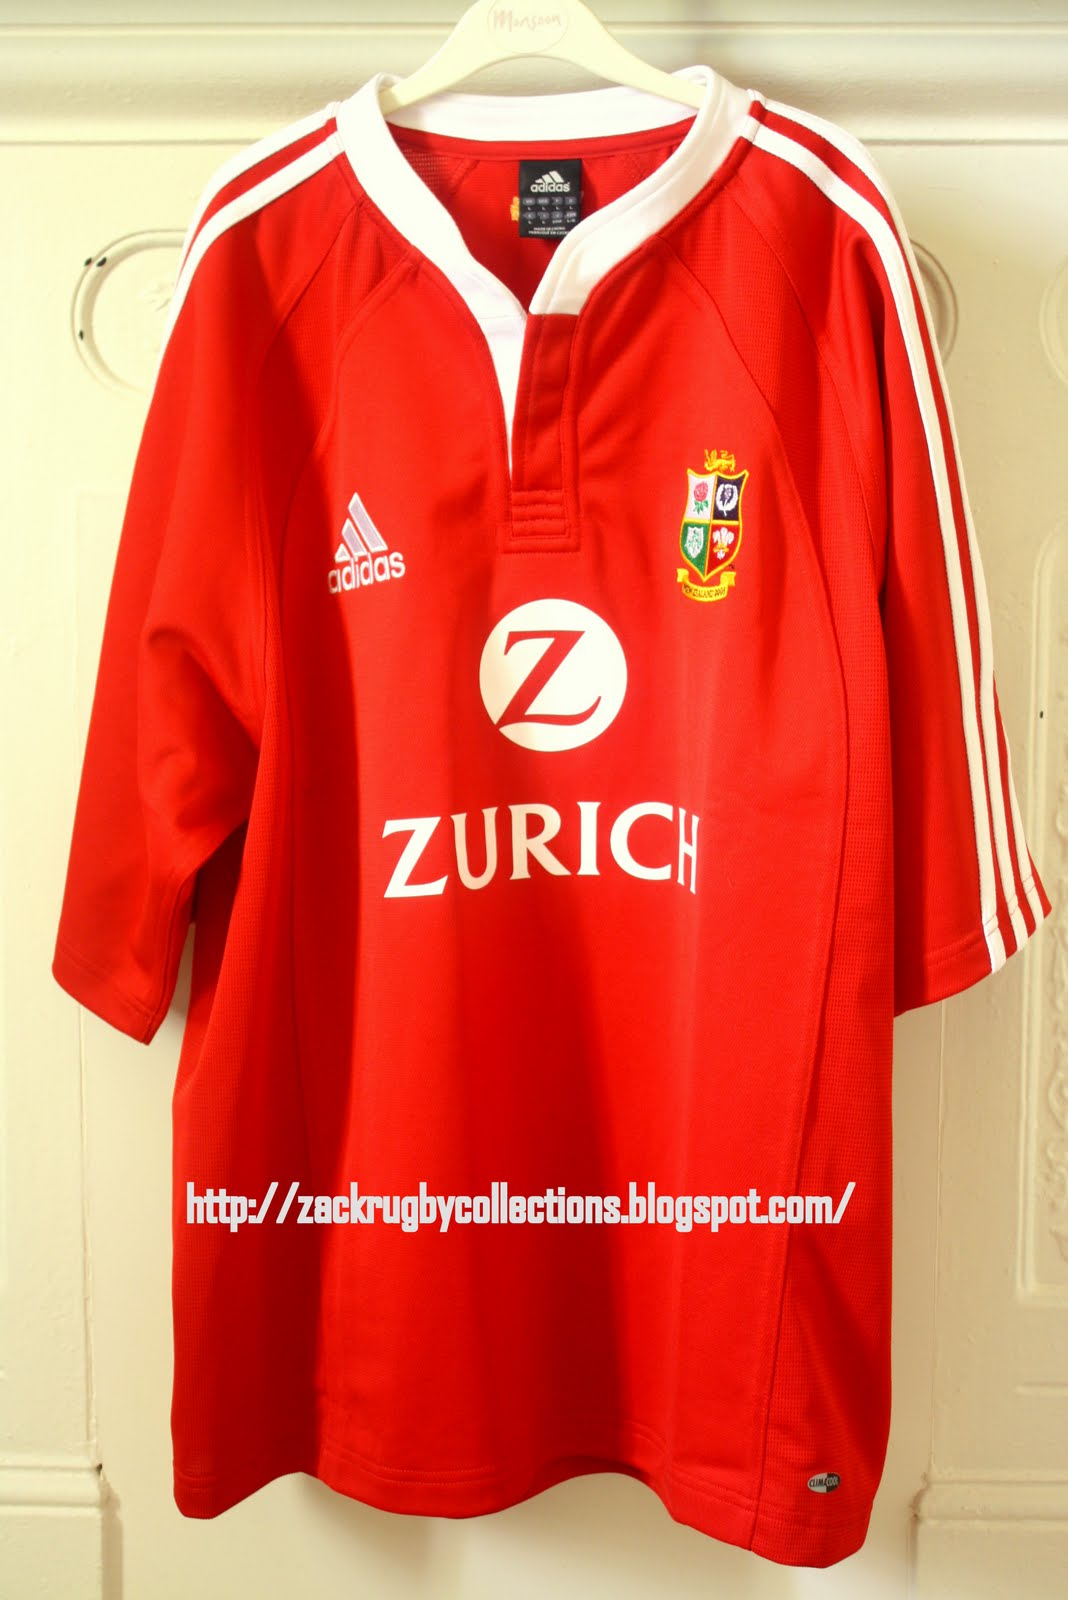 Chùm ảnh: Zurich jersey (10)